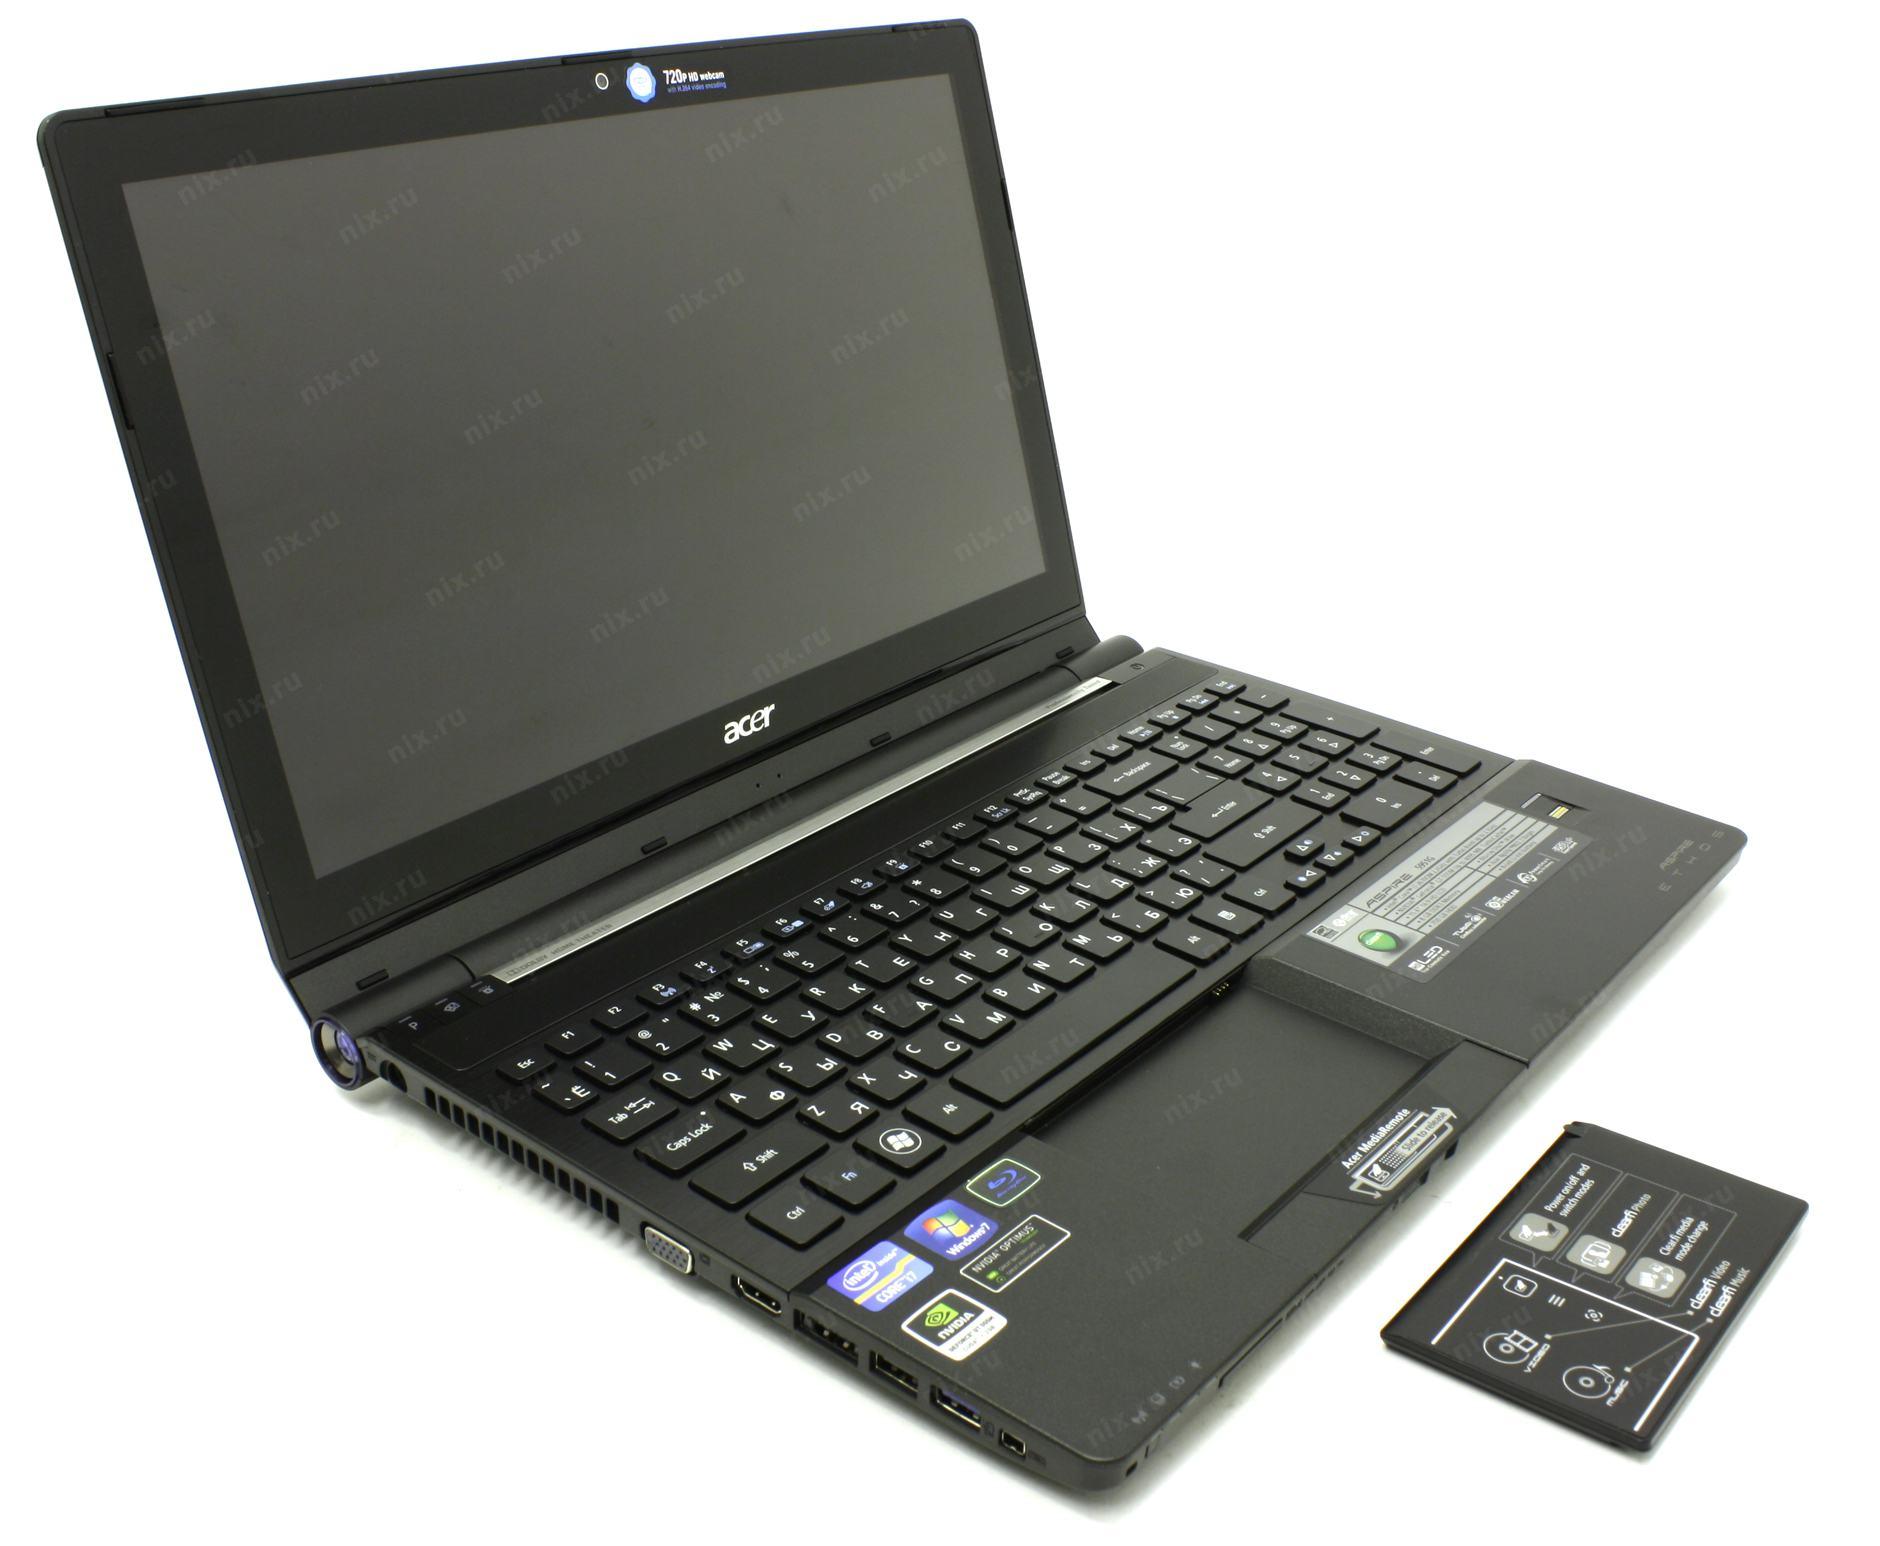 Acer Aspire 5951G Intel WLAN Driver FREE